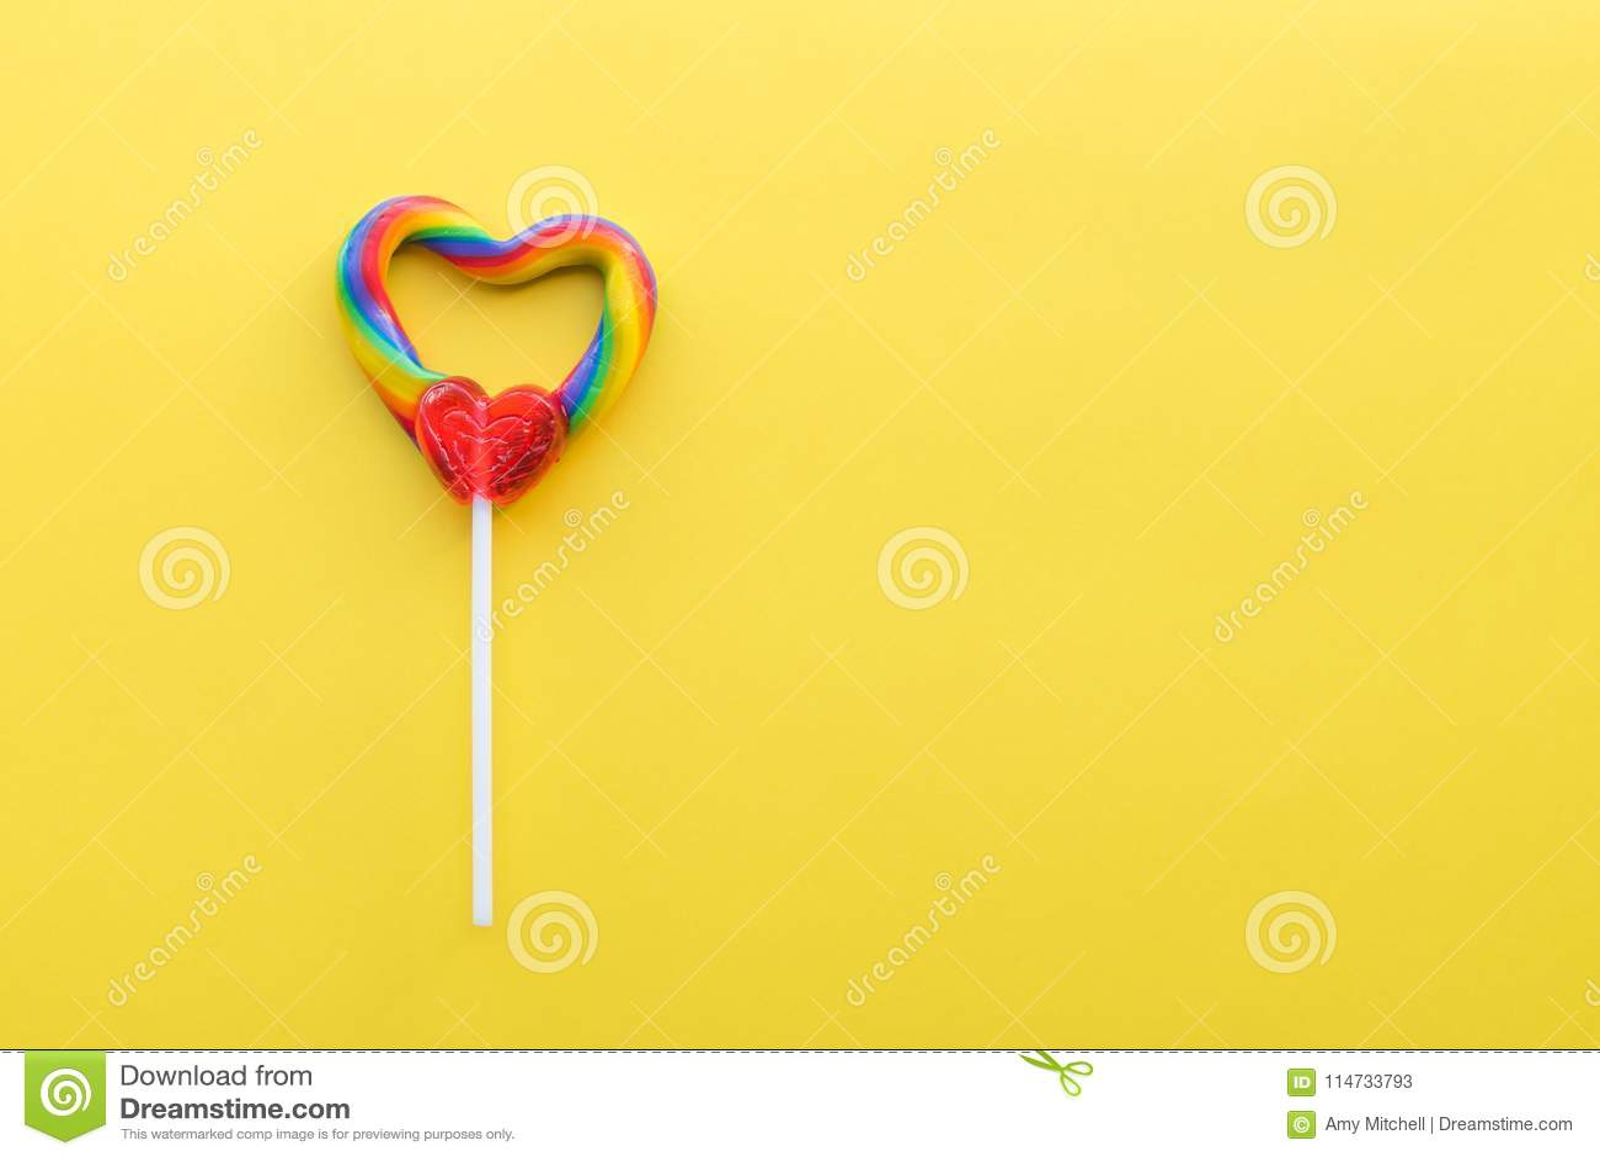 Heart shaped rainbow swirl lollipop on bright yellow solid background